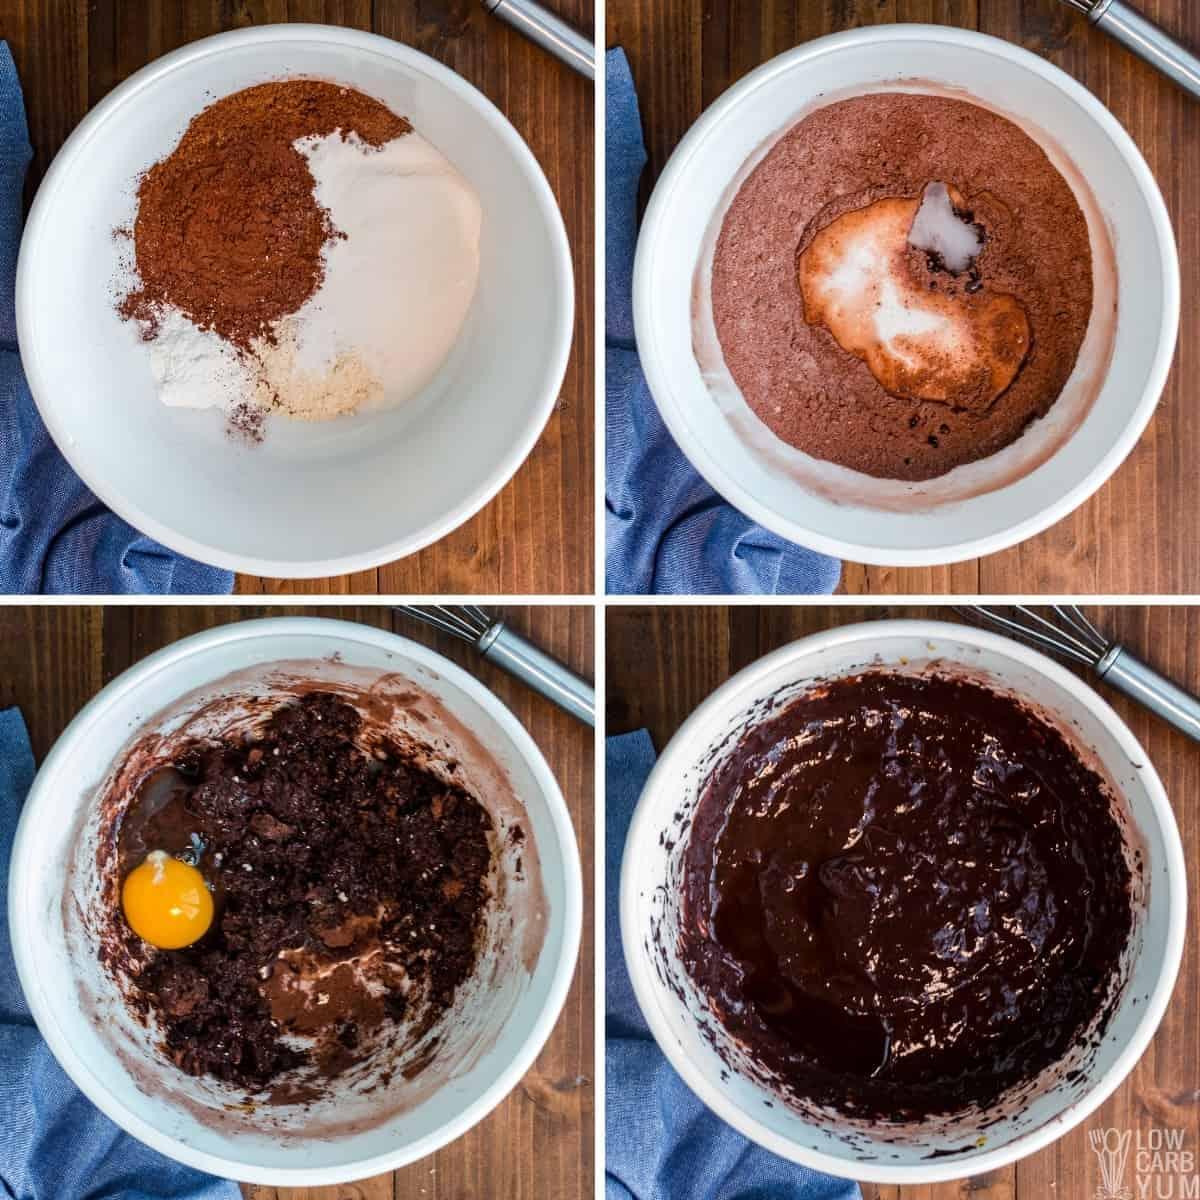 making the keto chocolate cake batter